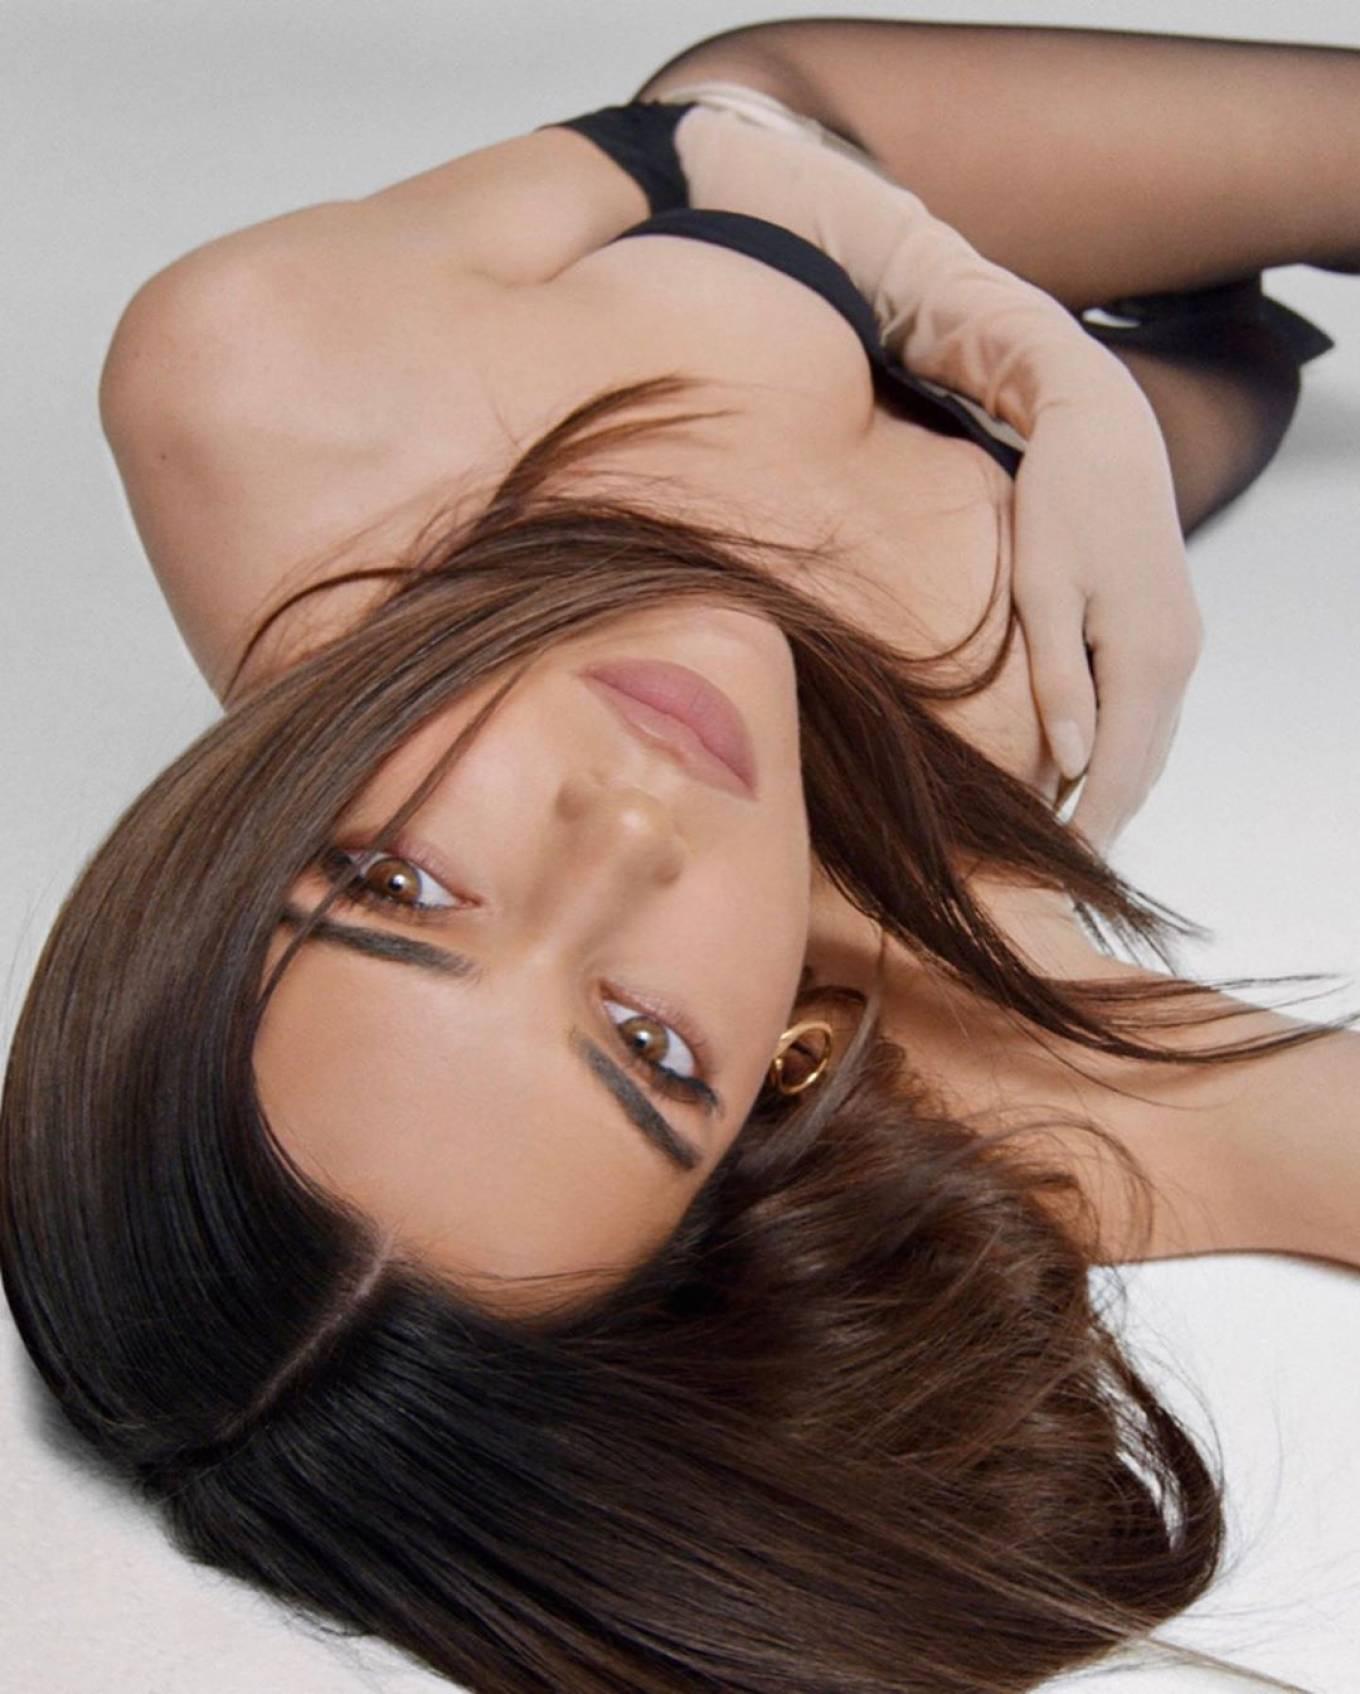 Kendall Jenner 2020 : Kendall Jenner – Kendall x Kylie Cosmetics 2020-12